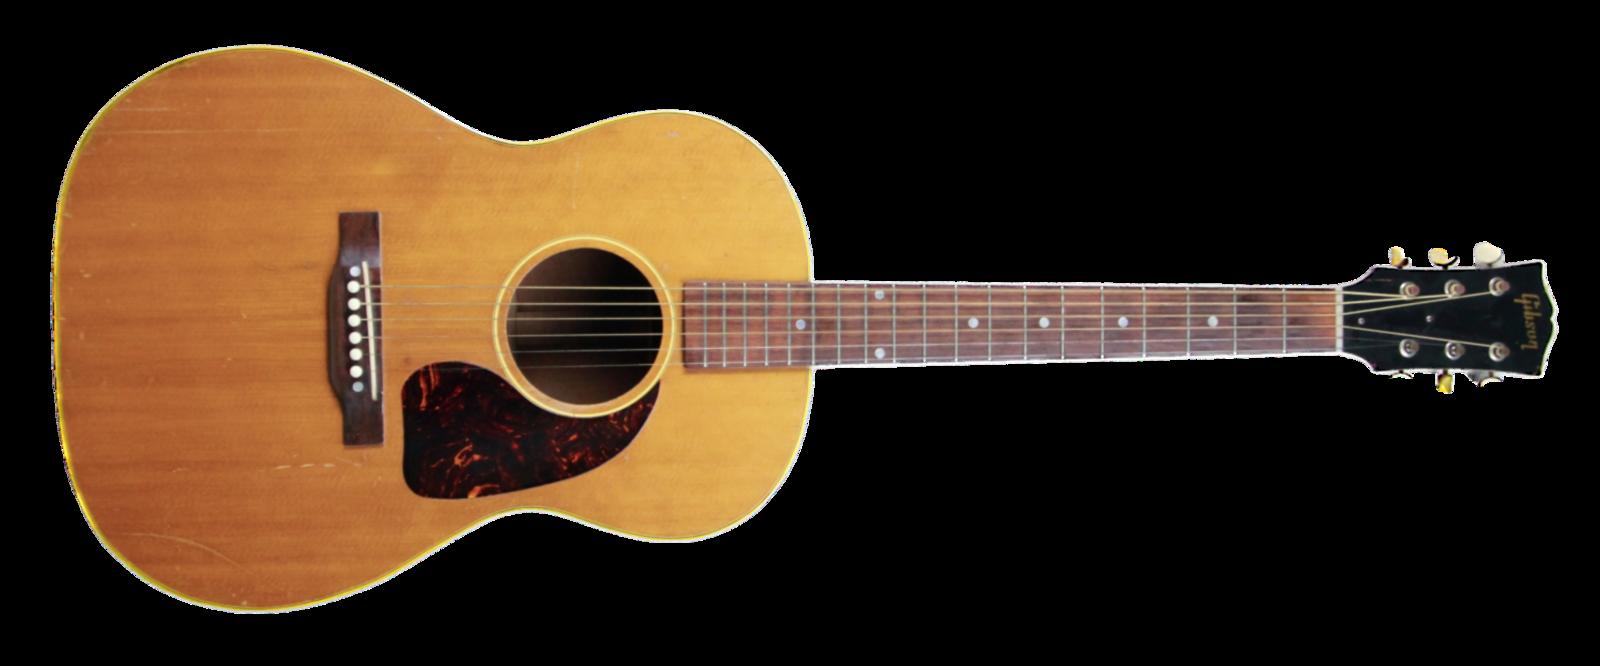 Taylor Guitars For Sale >> 1949 Gibson LG3 - Vintage & Modern Guitars